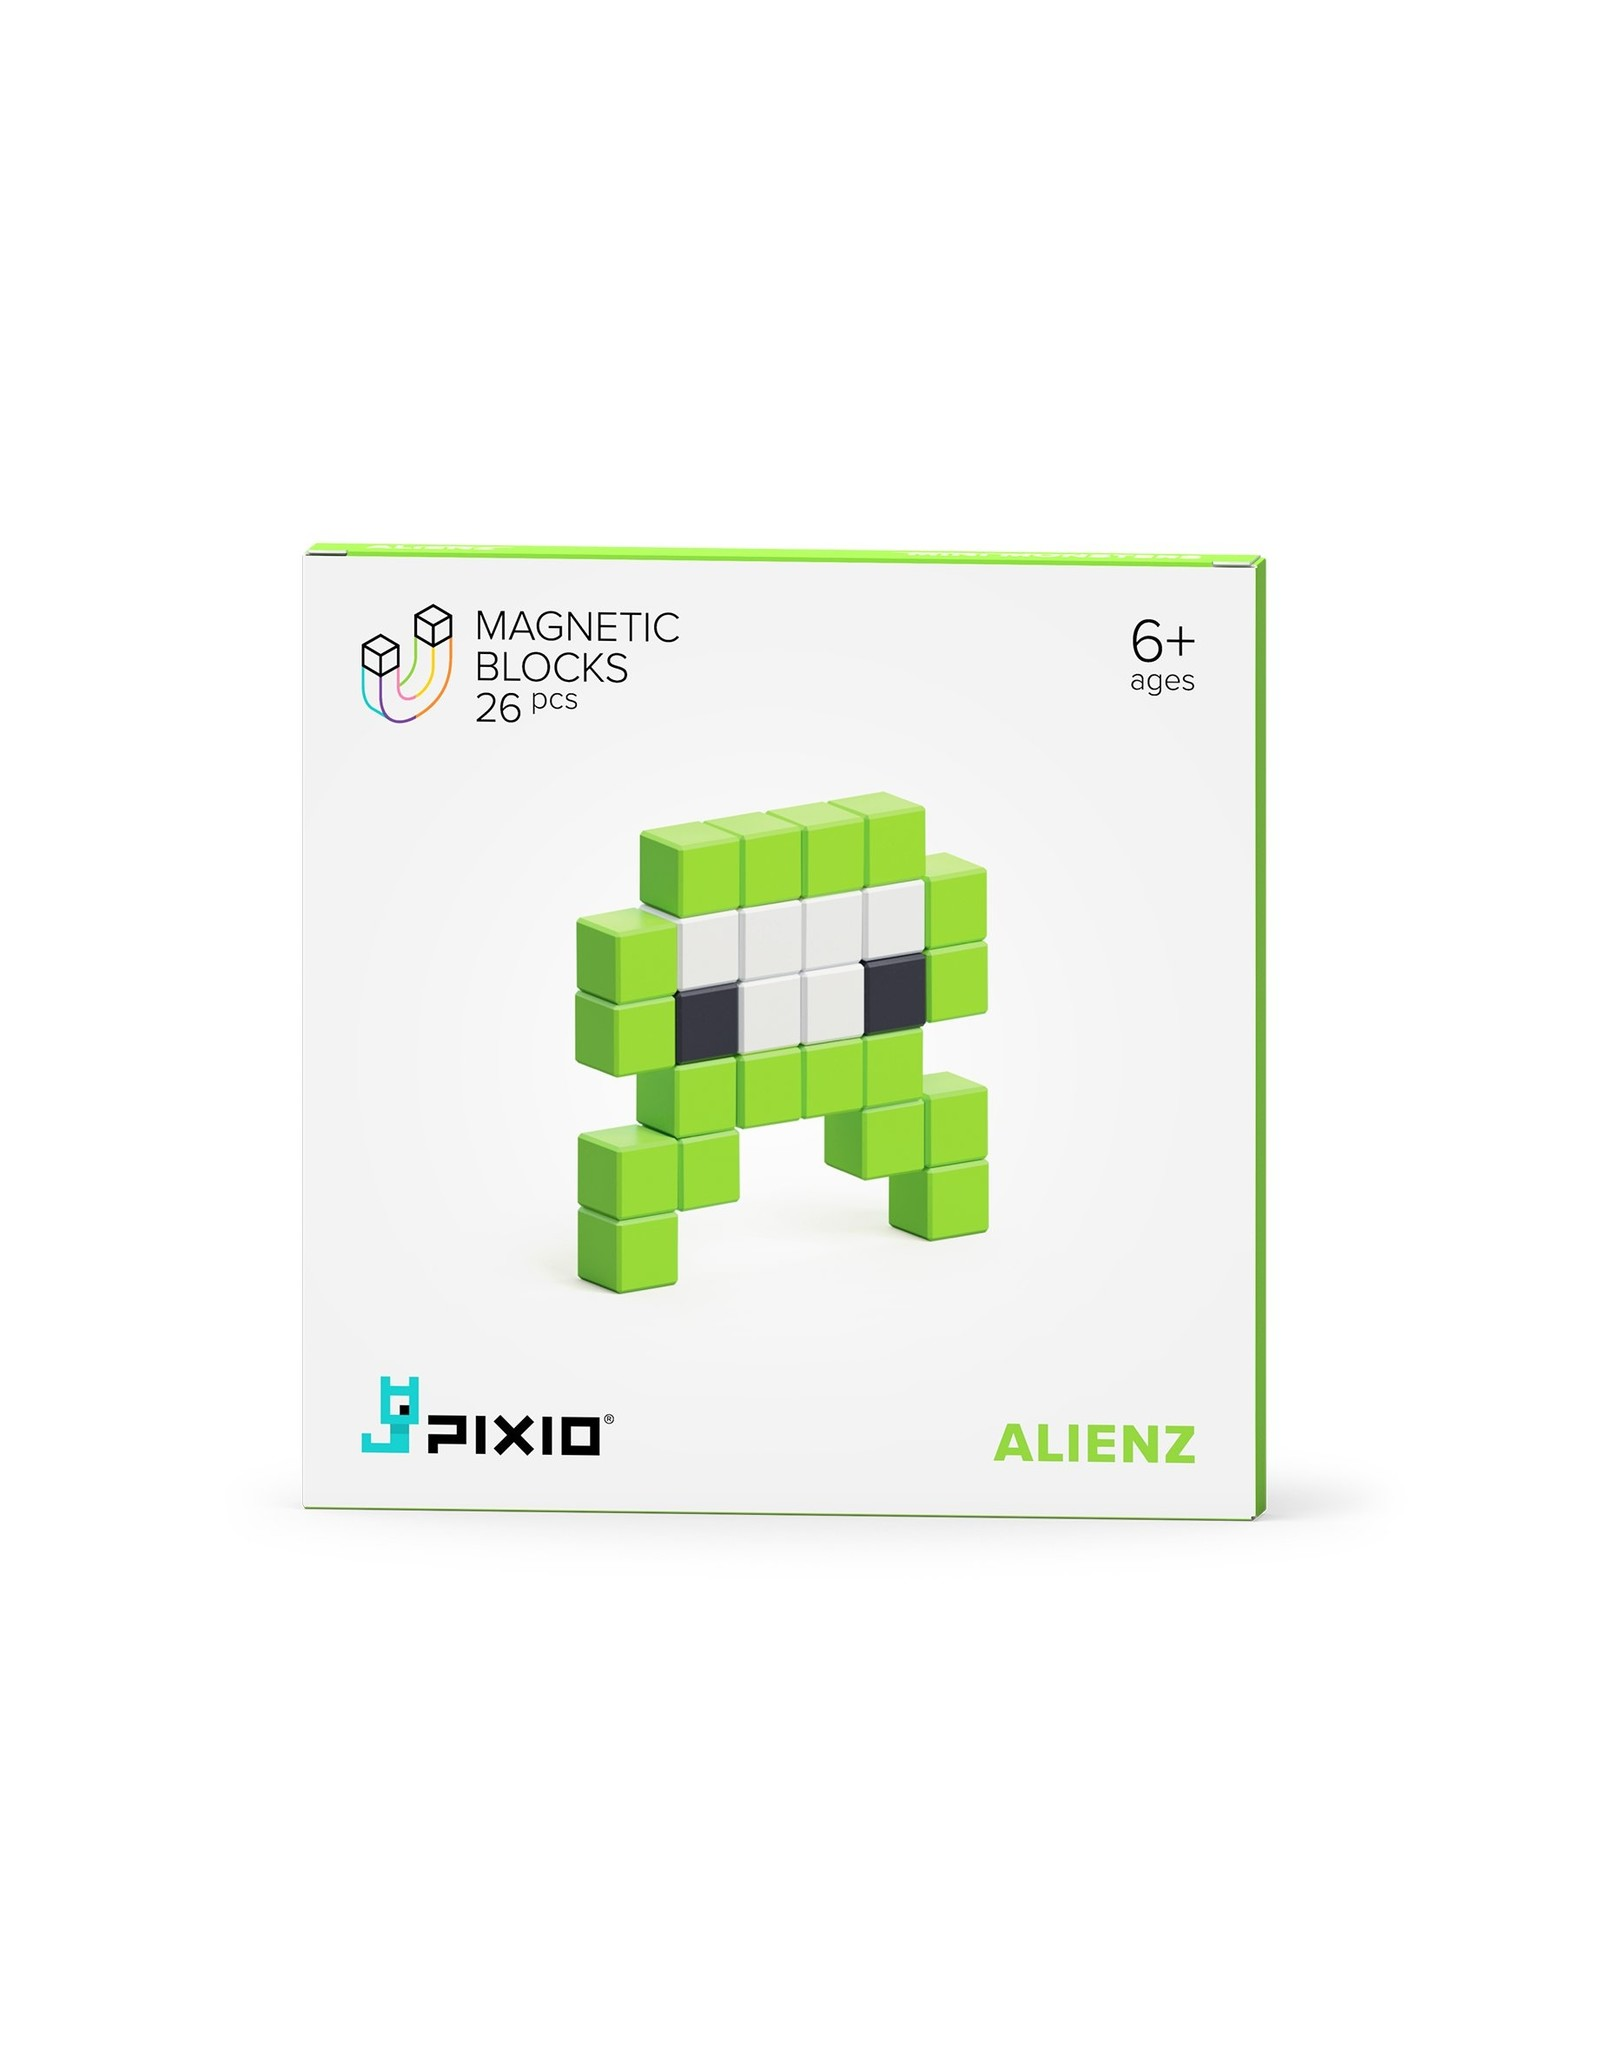 Pixio Mini Monsterz Magnetic Building Blocks